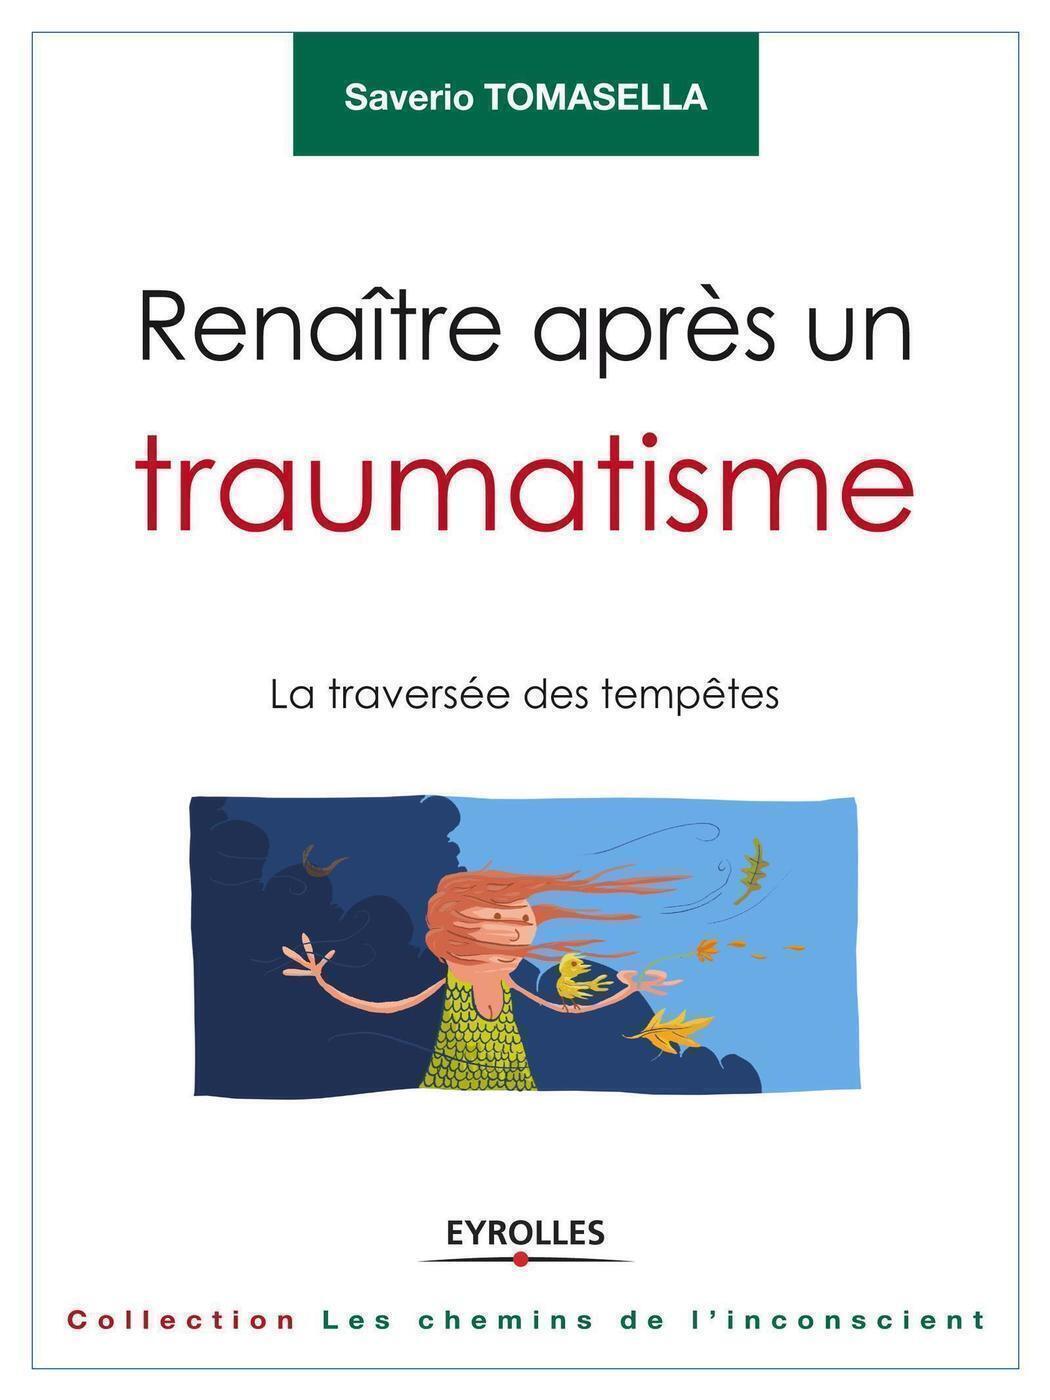 RENAITRE APRES UN TRAUMATISME LA TRAVERSEE DES TEMPETES